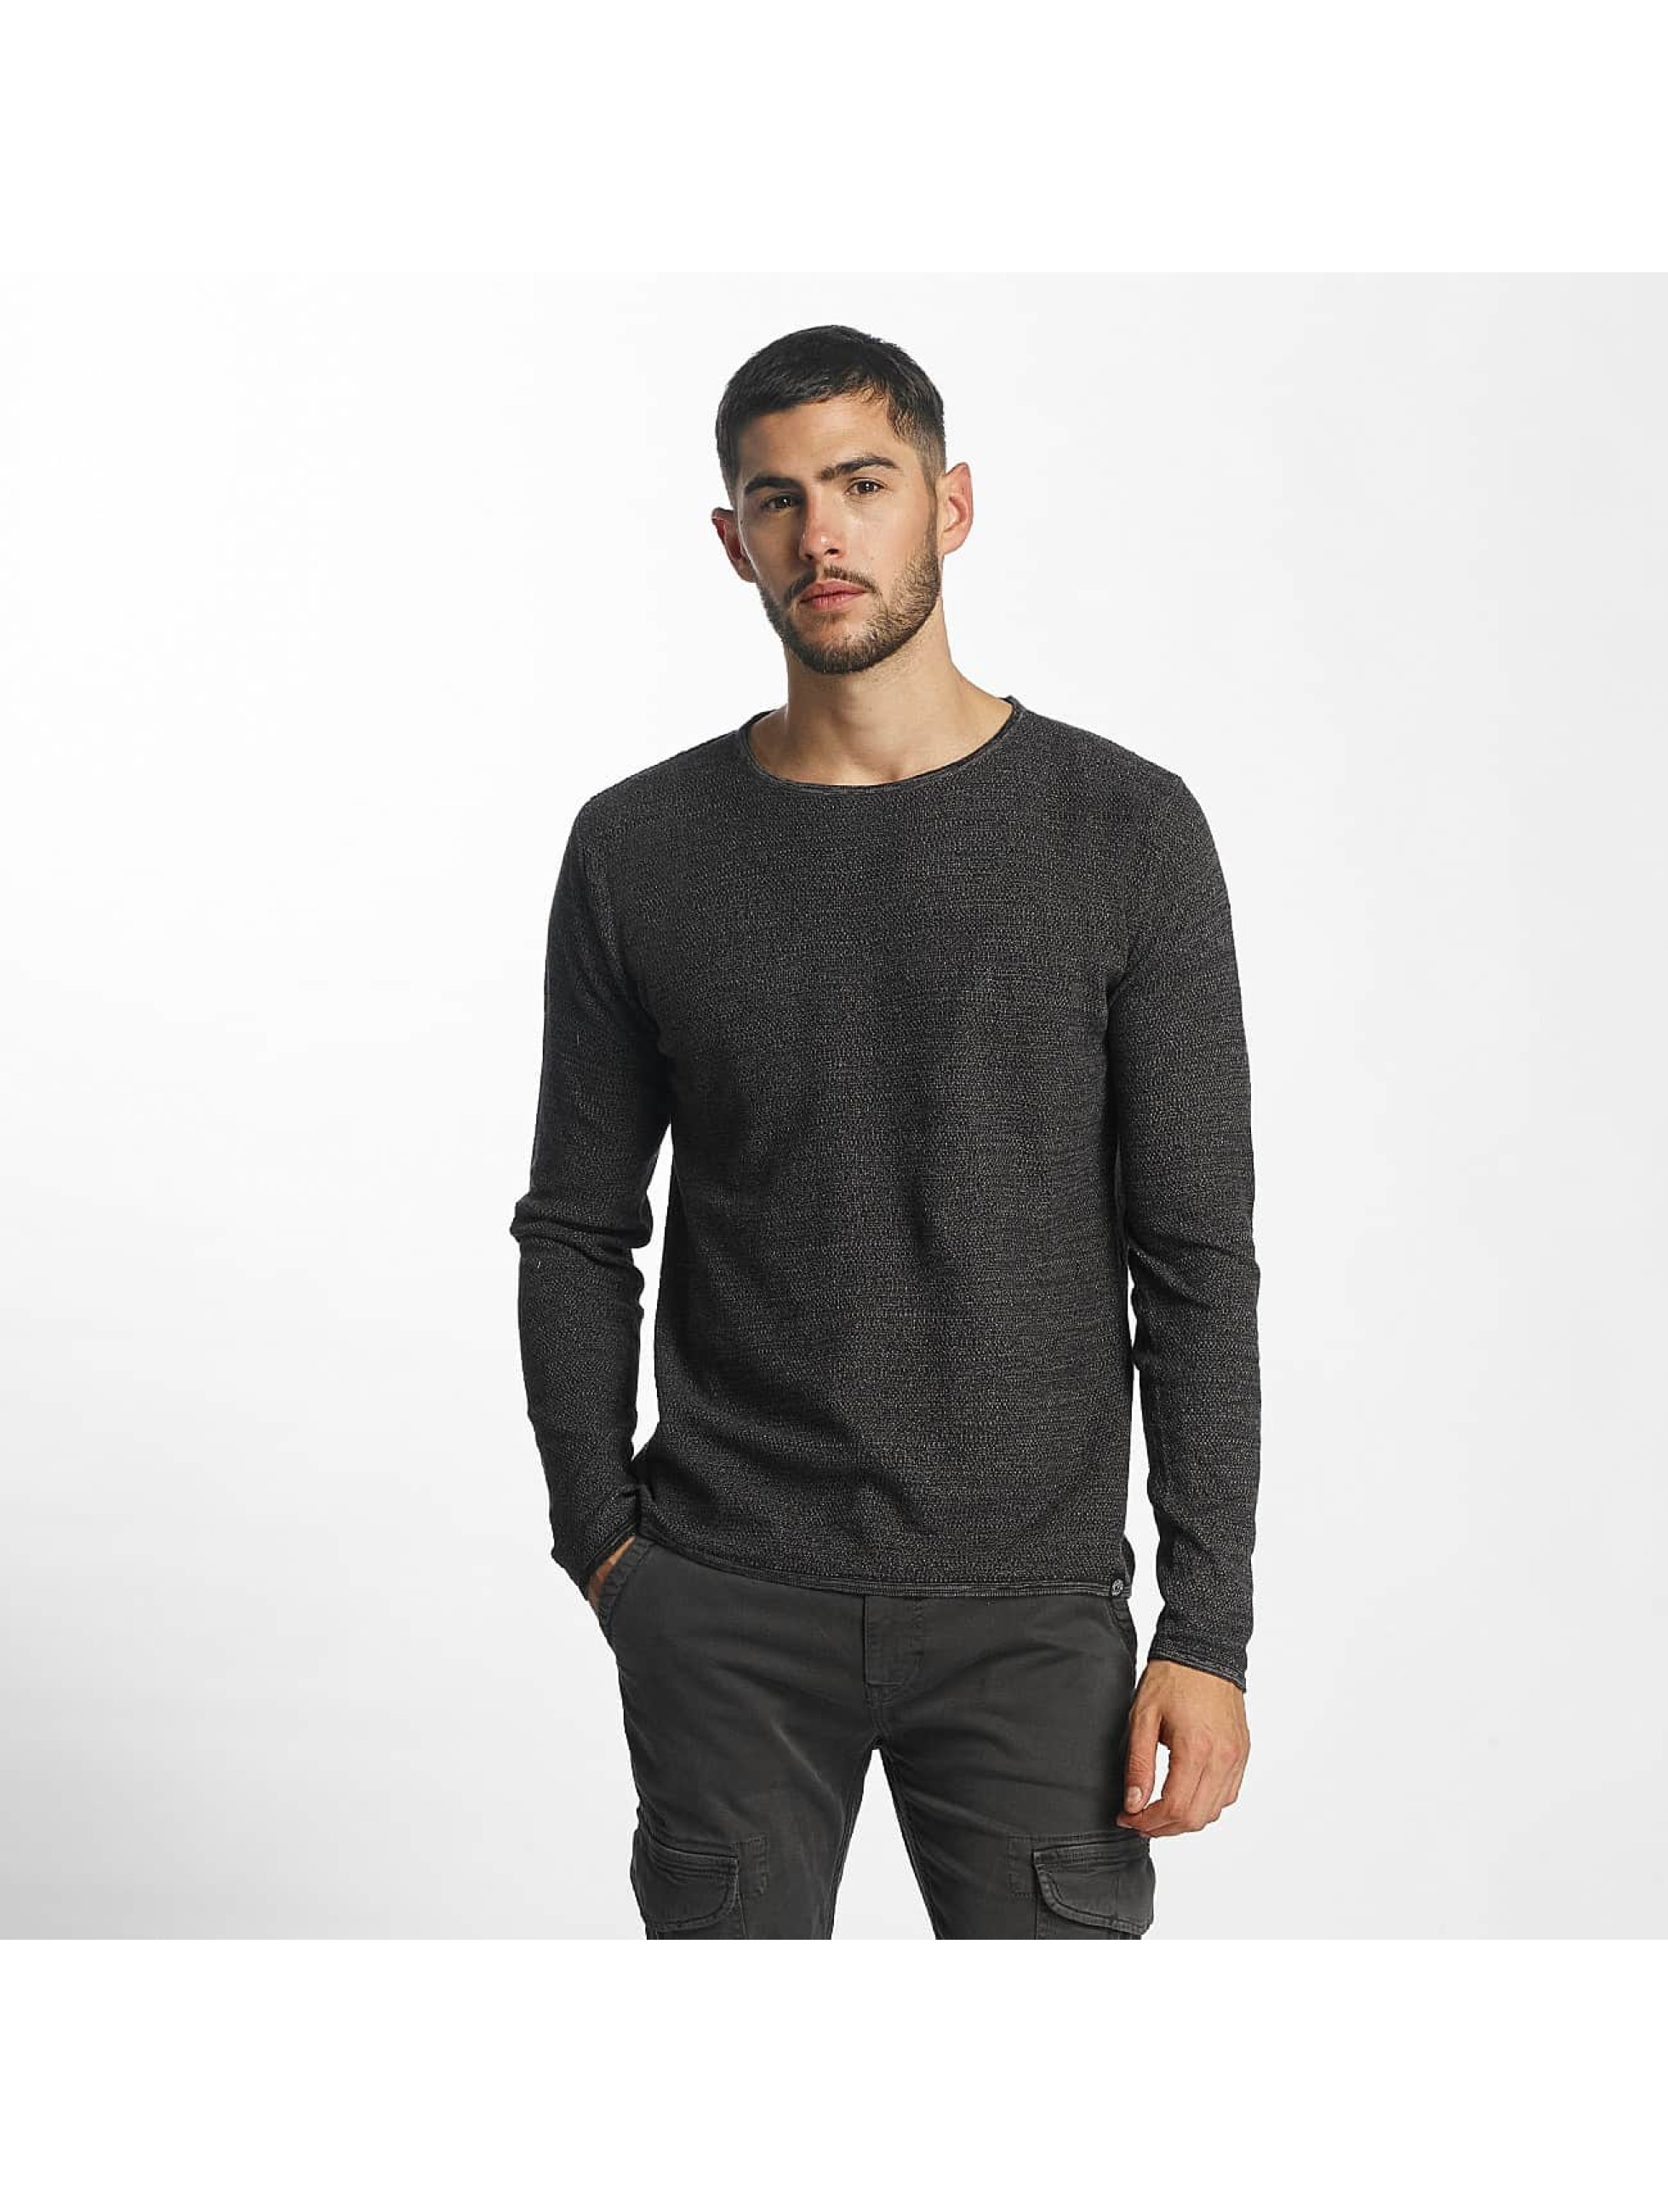 Solid Männer Pullover Jasen in grau